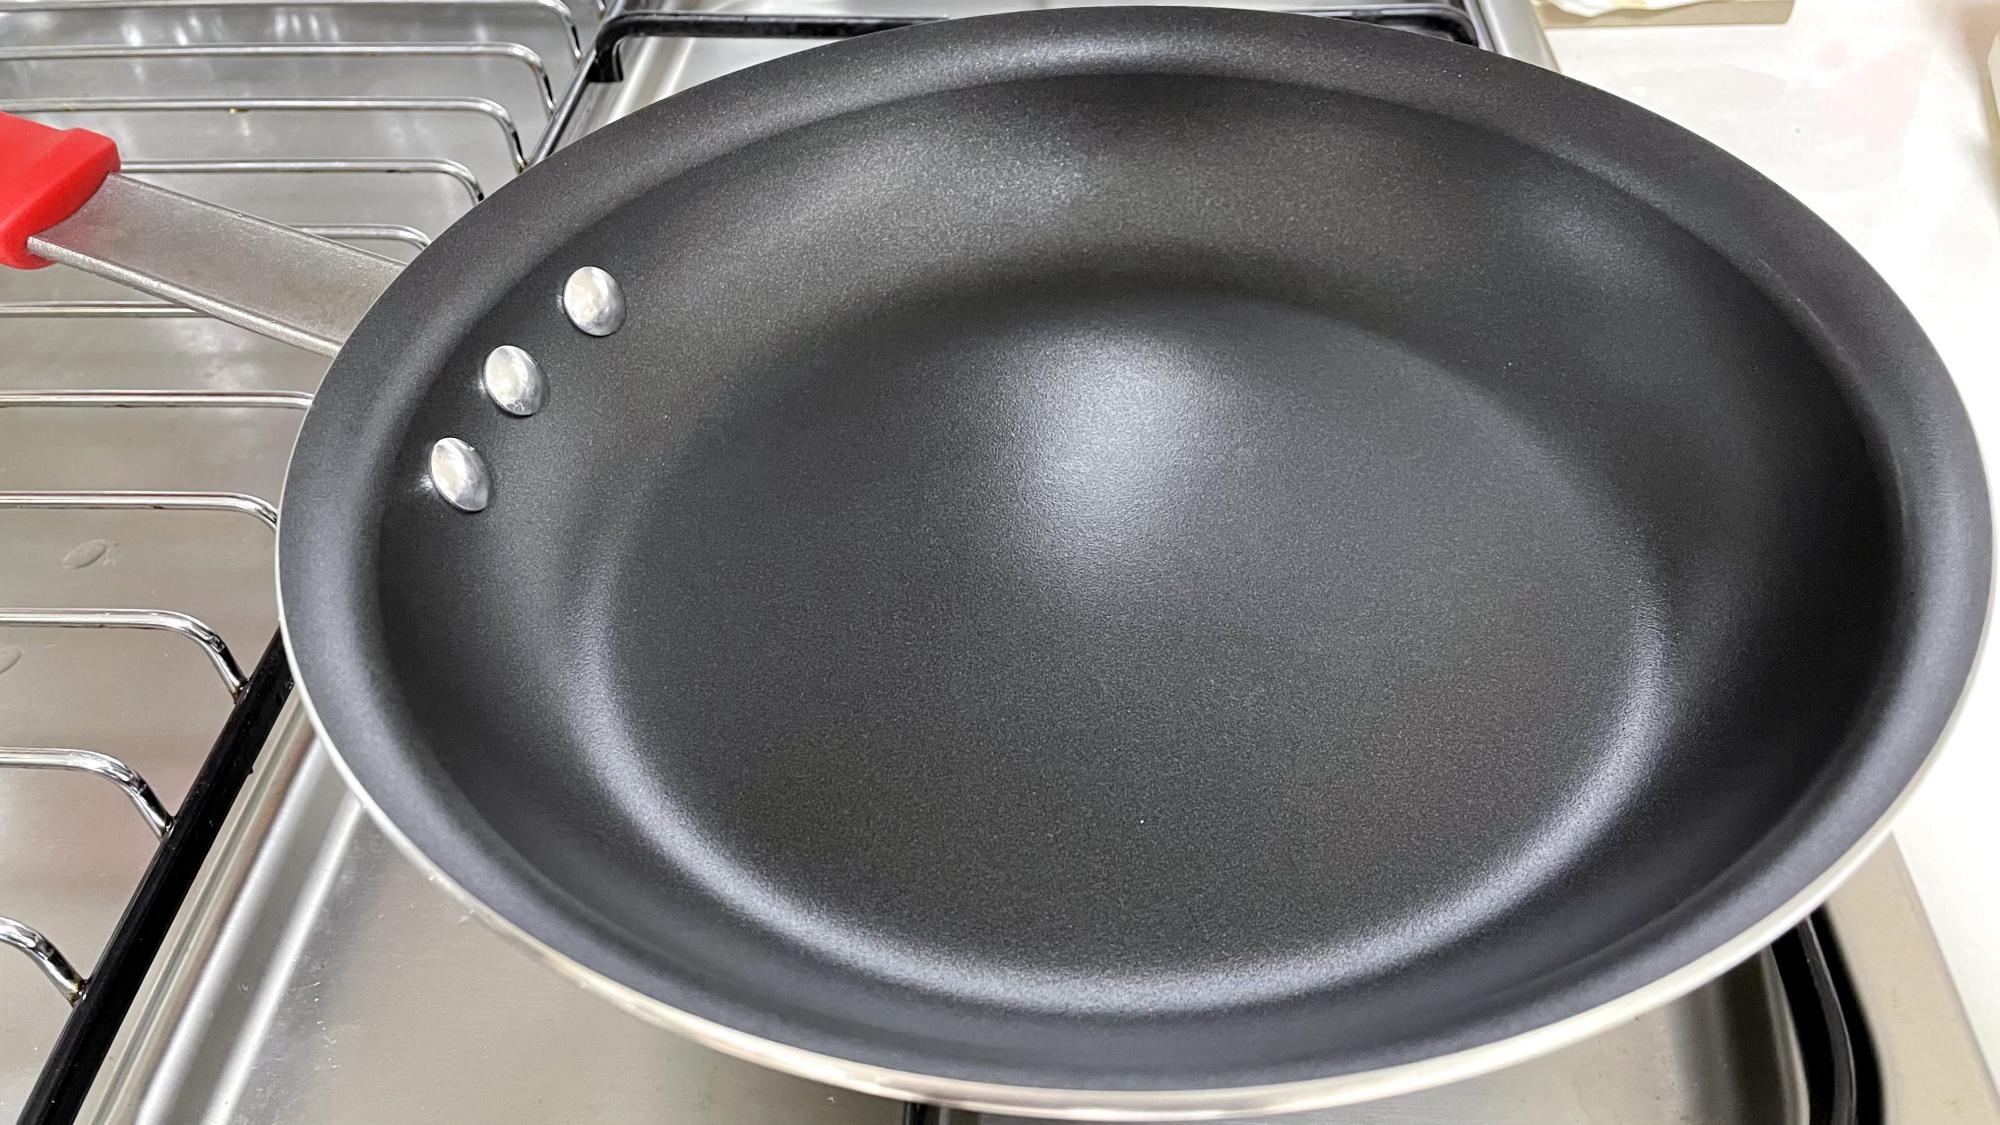 Tramontina Professional Nonstick Fry Pan